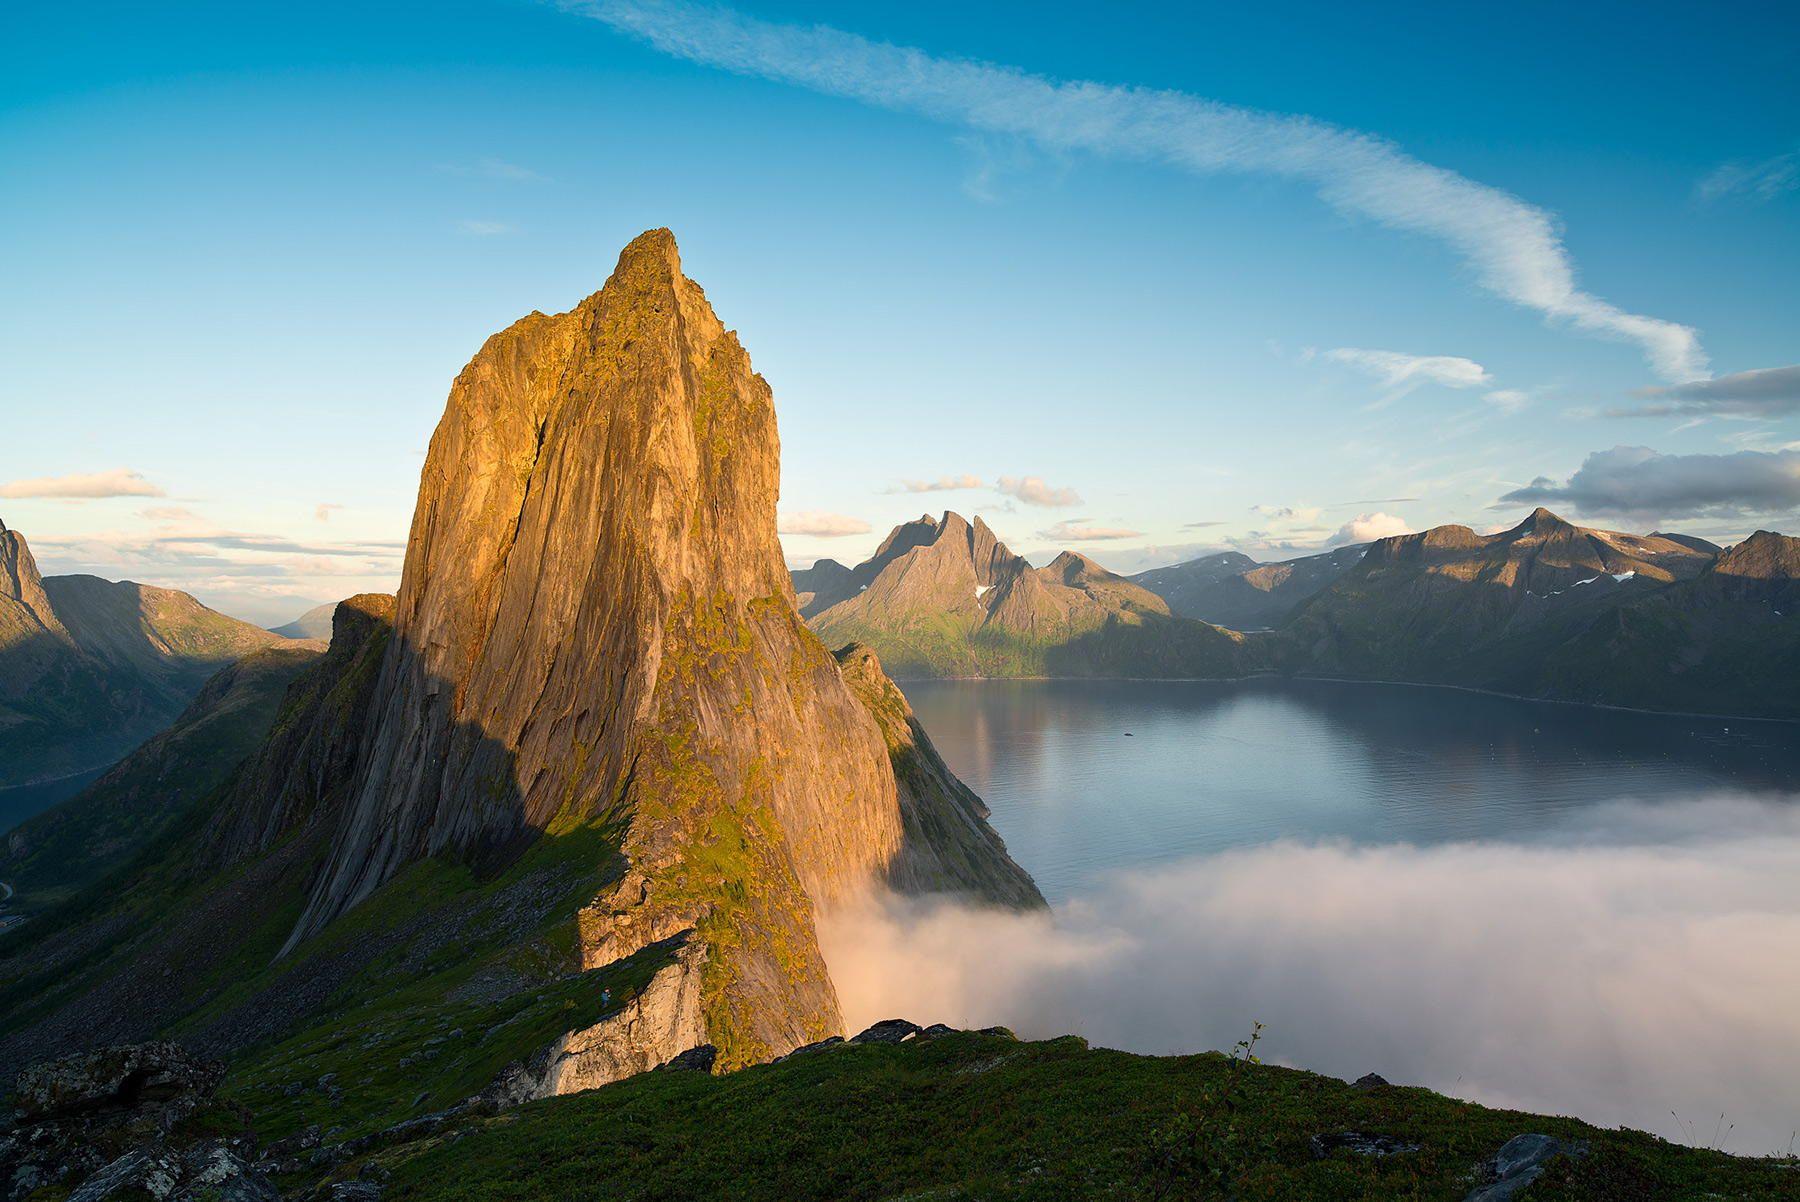 Гора Сегла в Норвегии